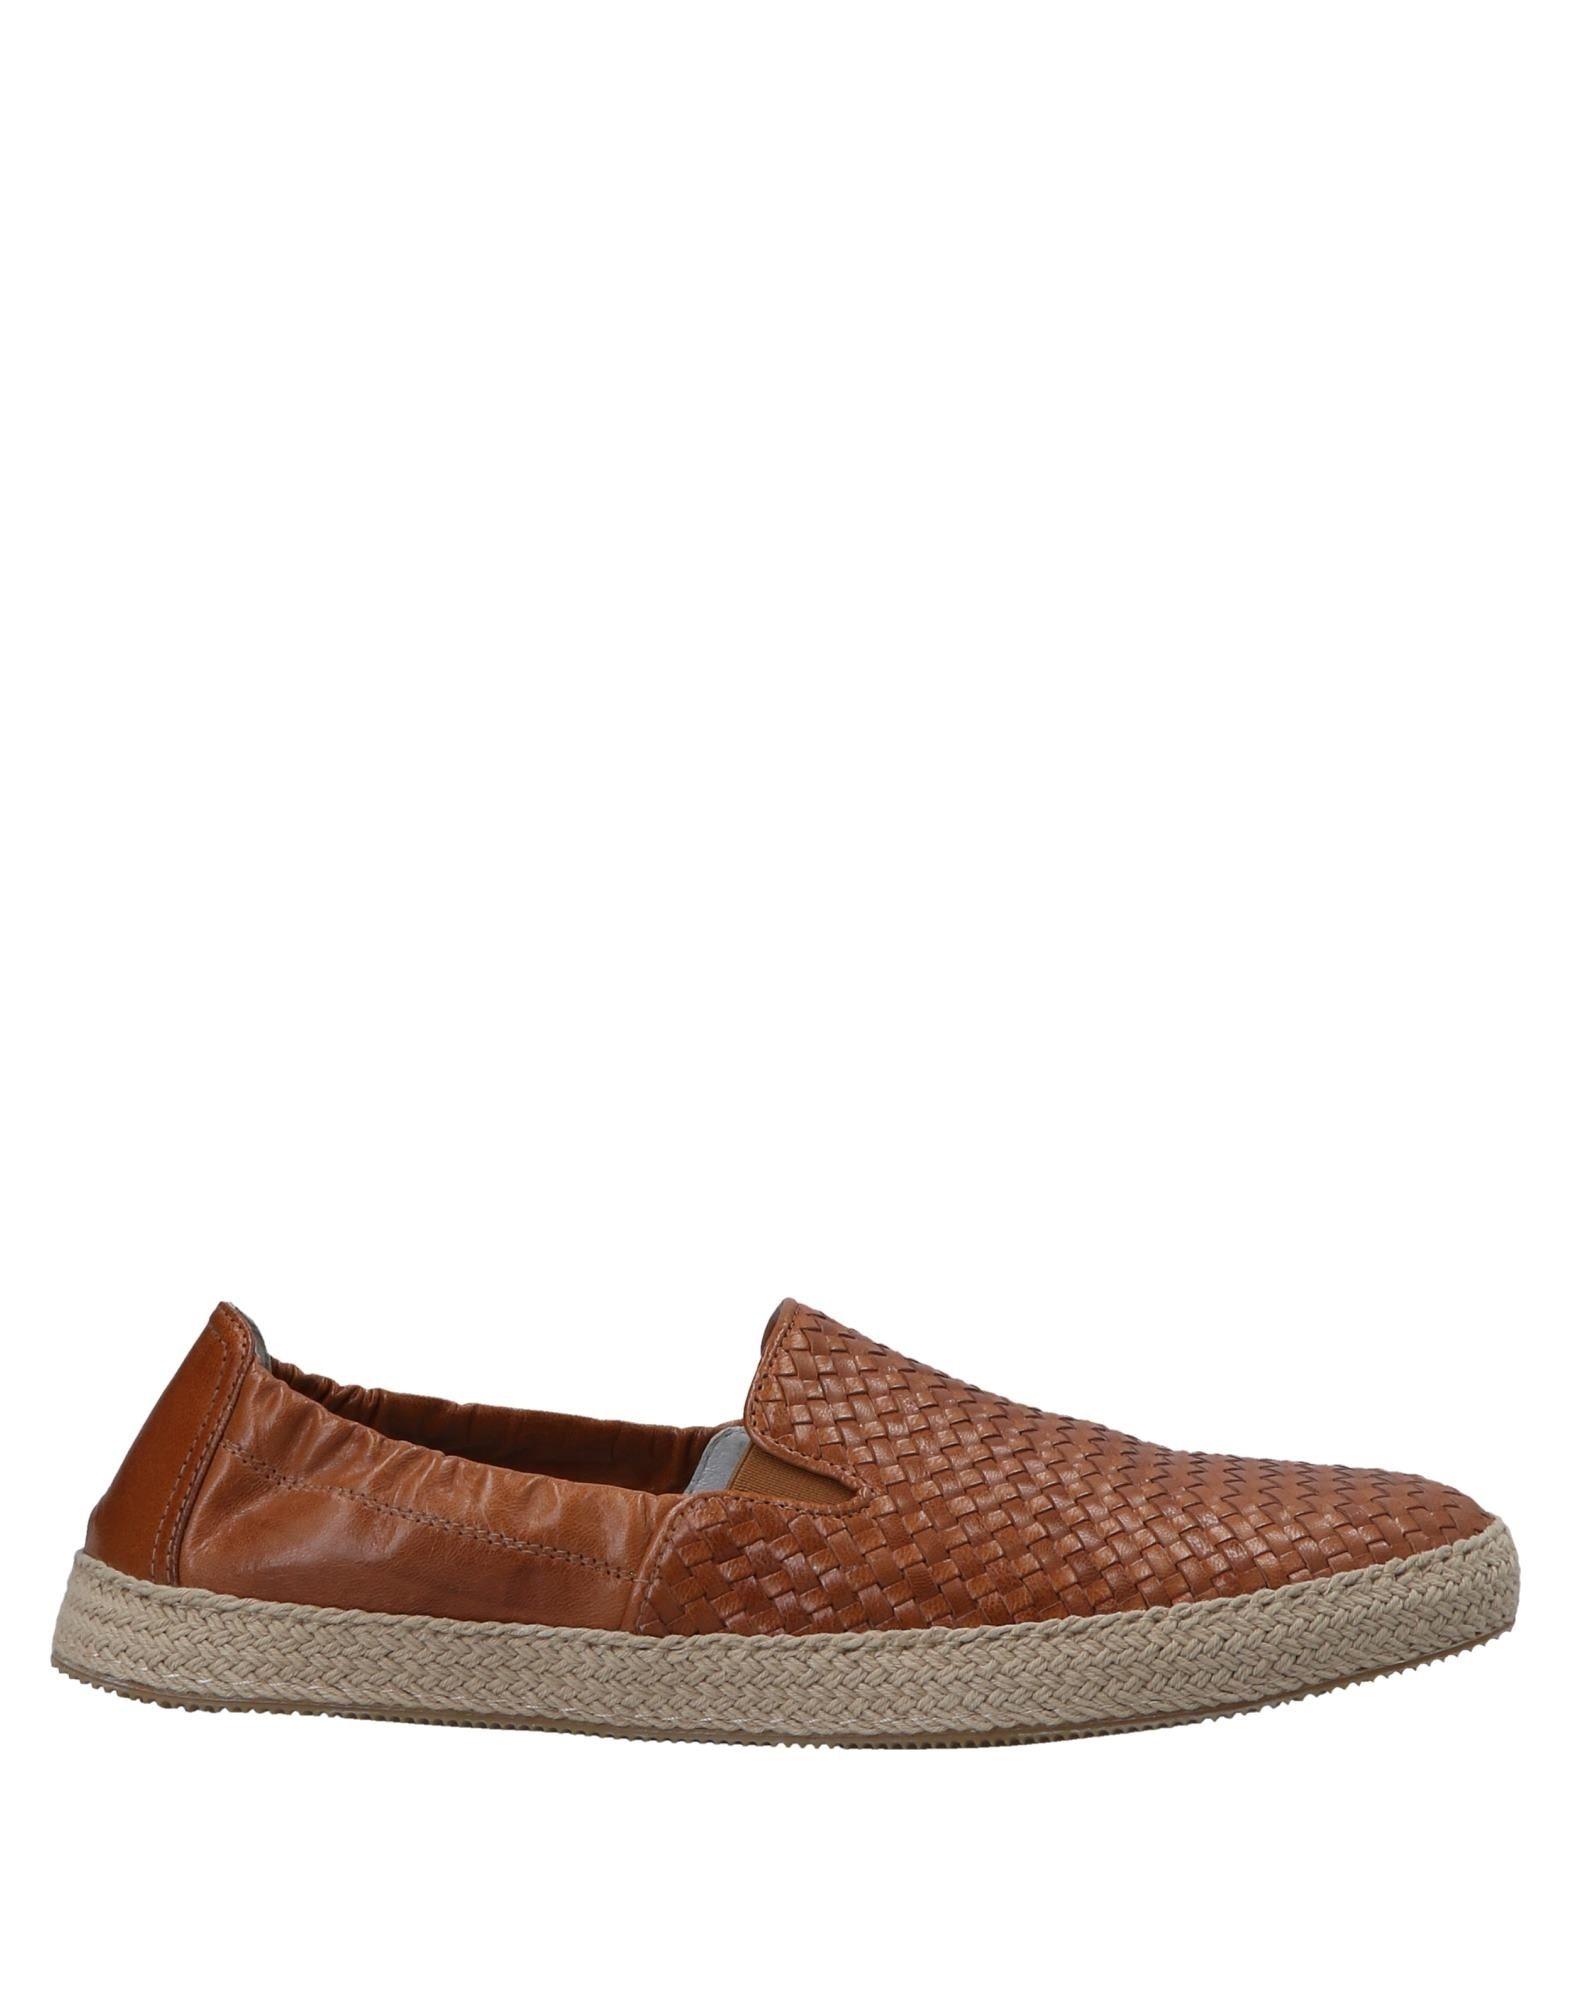 Roberto Botticelli Sneakers Herren  11554293OU Gute Qualität beliebte Schuhe